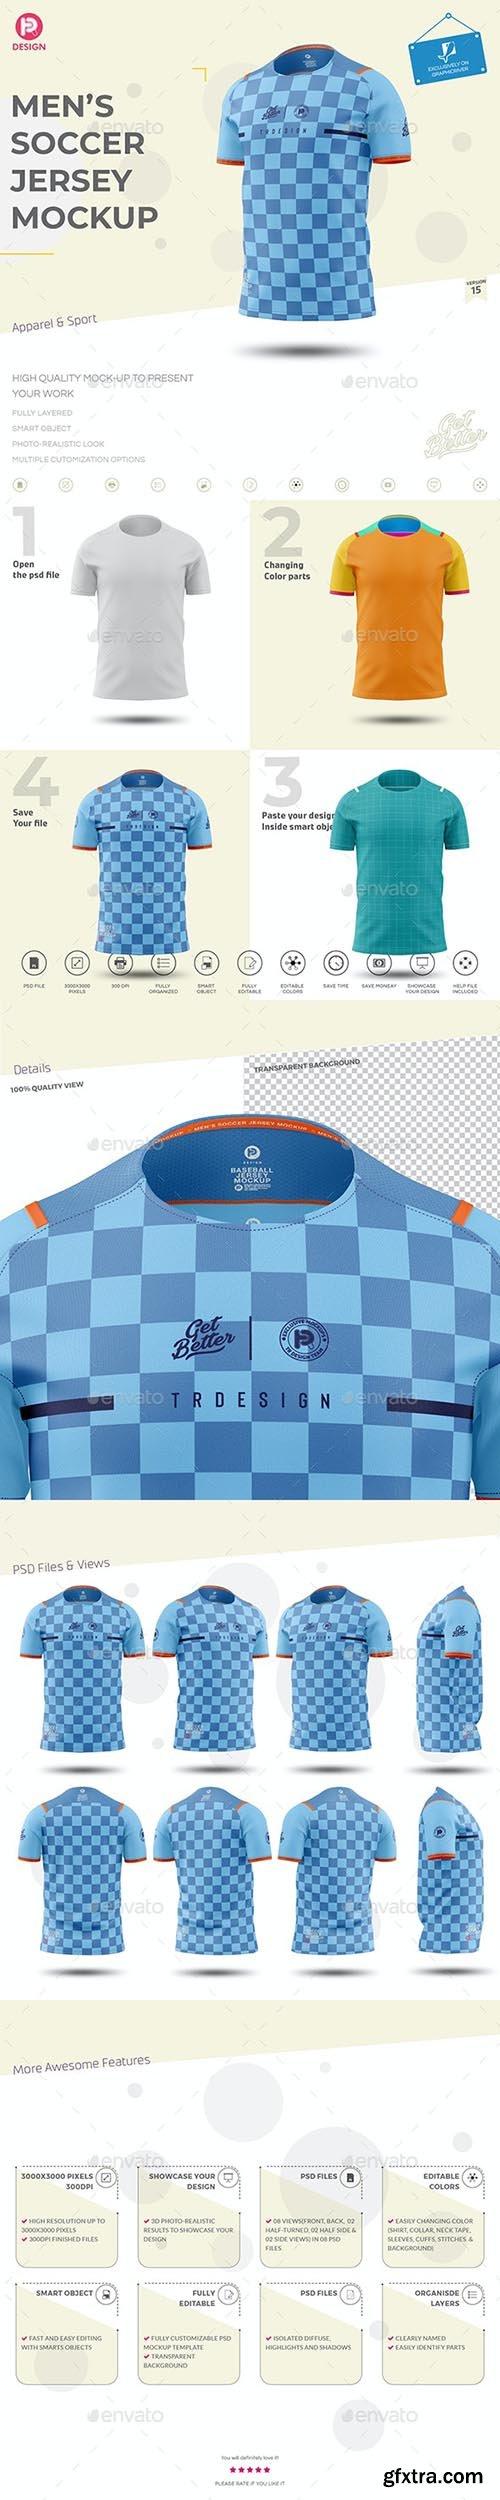 GraphicRiver - Men's Soccer Jersey Mockup V15 33497023